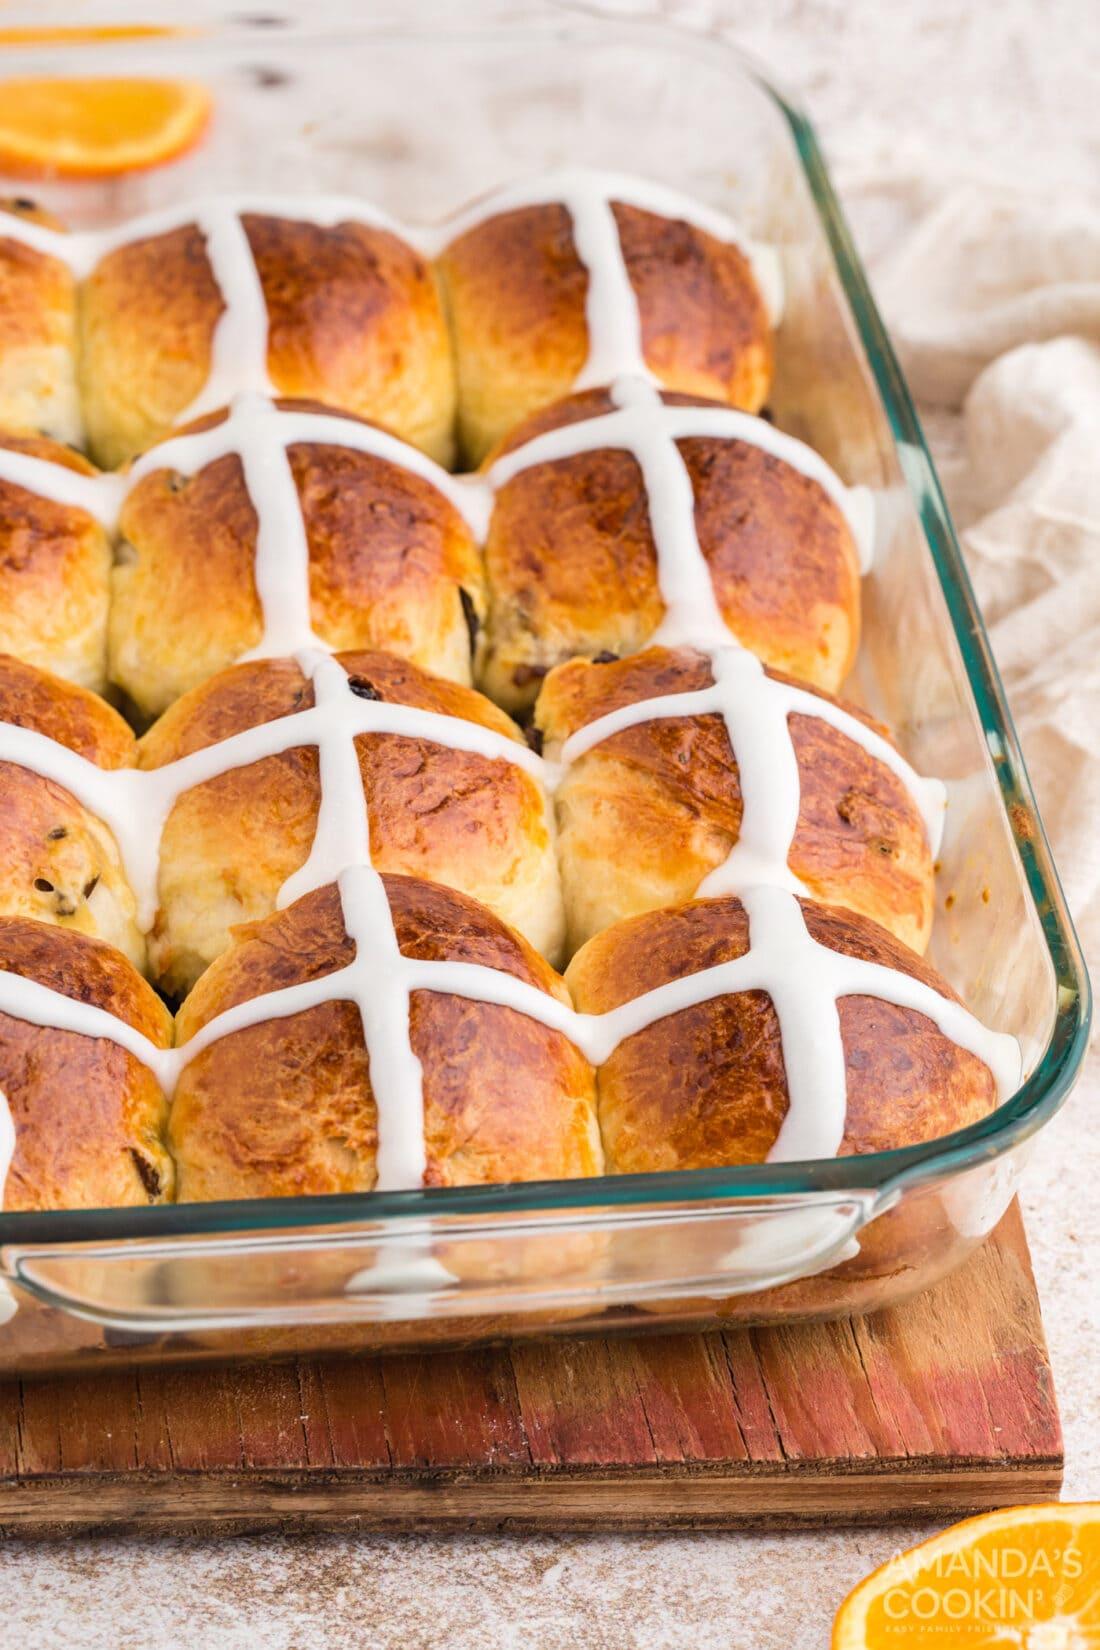 a glass pan of Hot Cross Buns